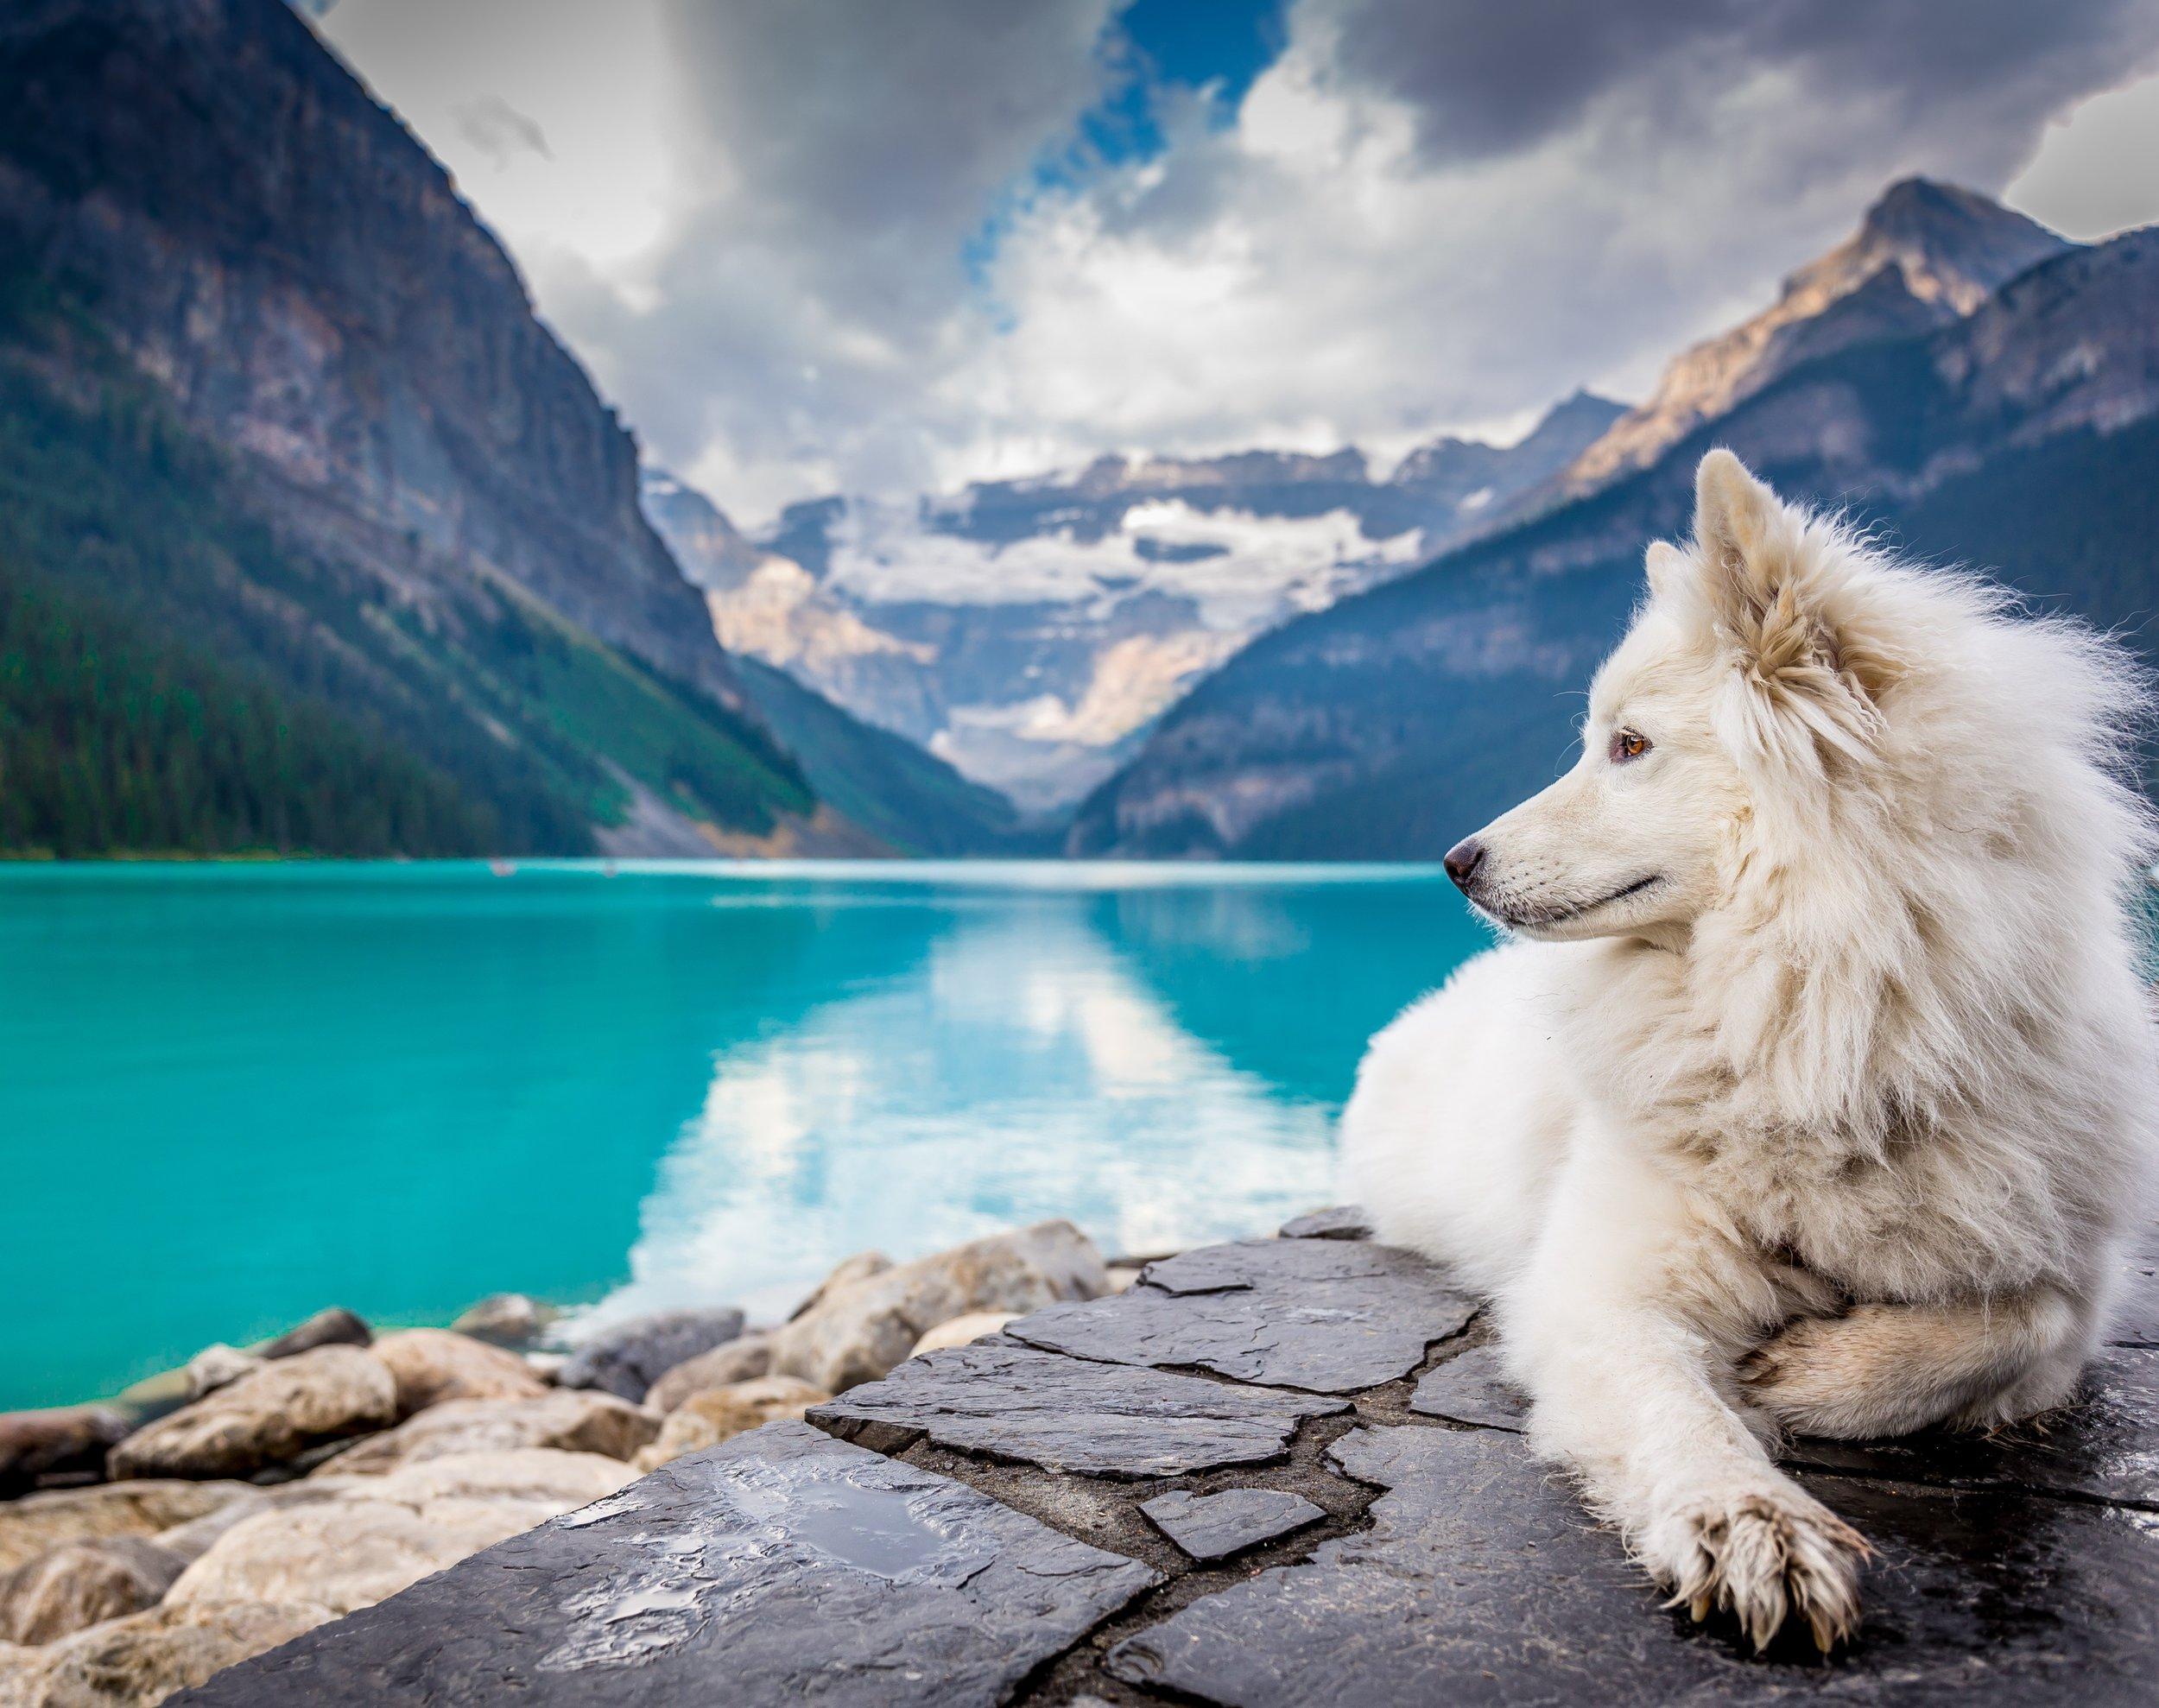 whitedoglandscape.jpg